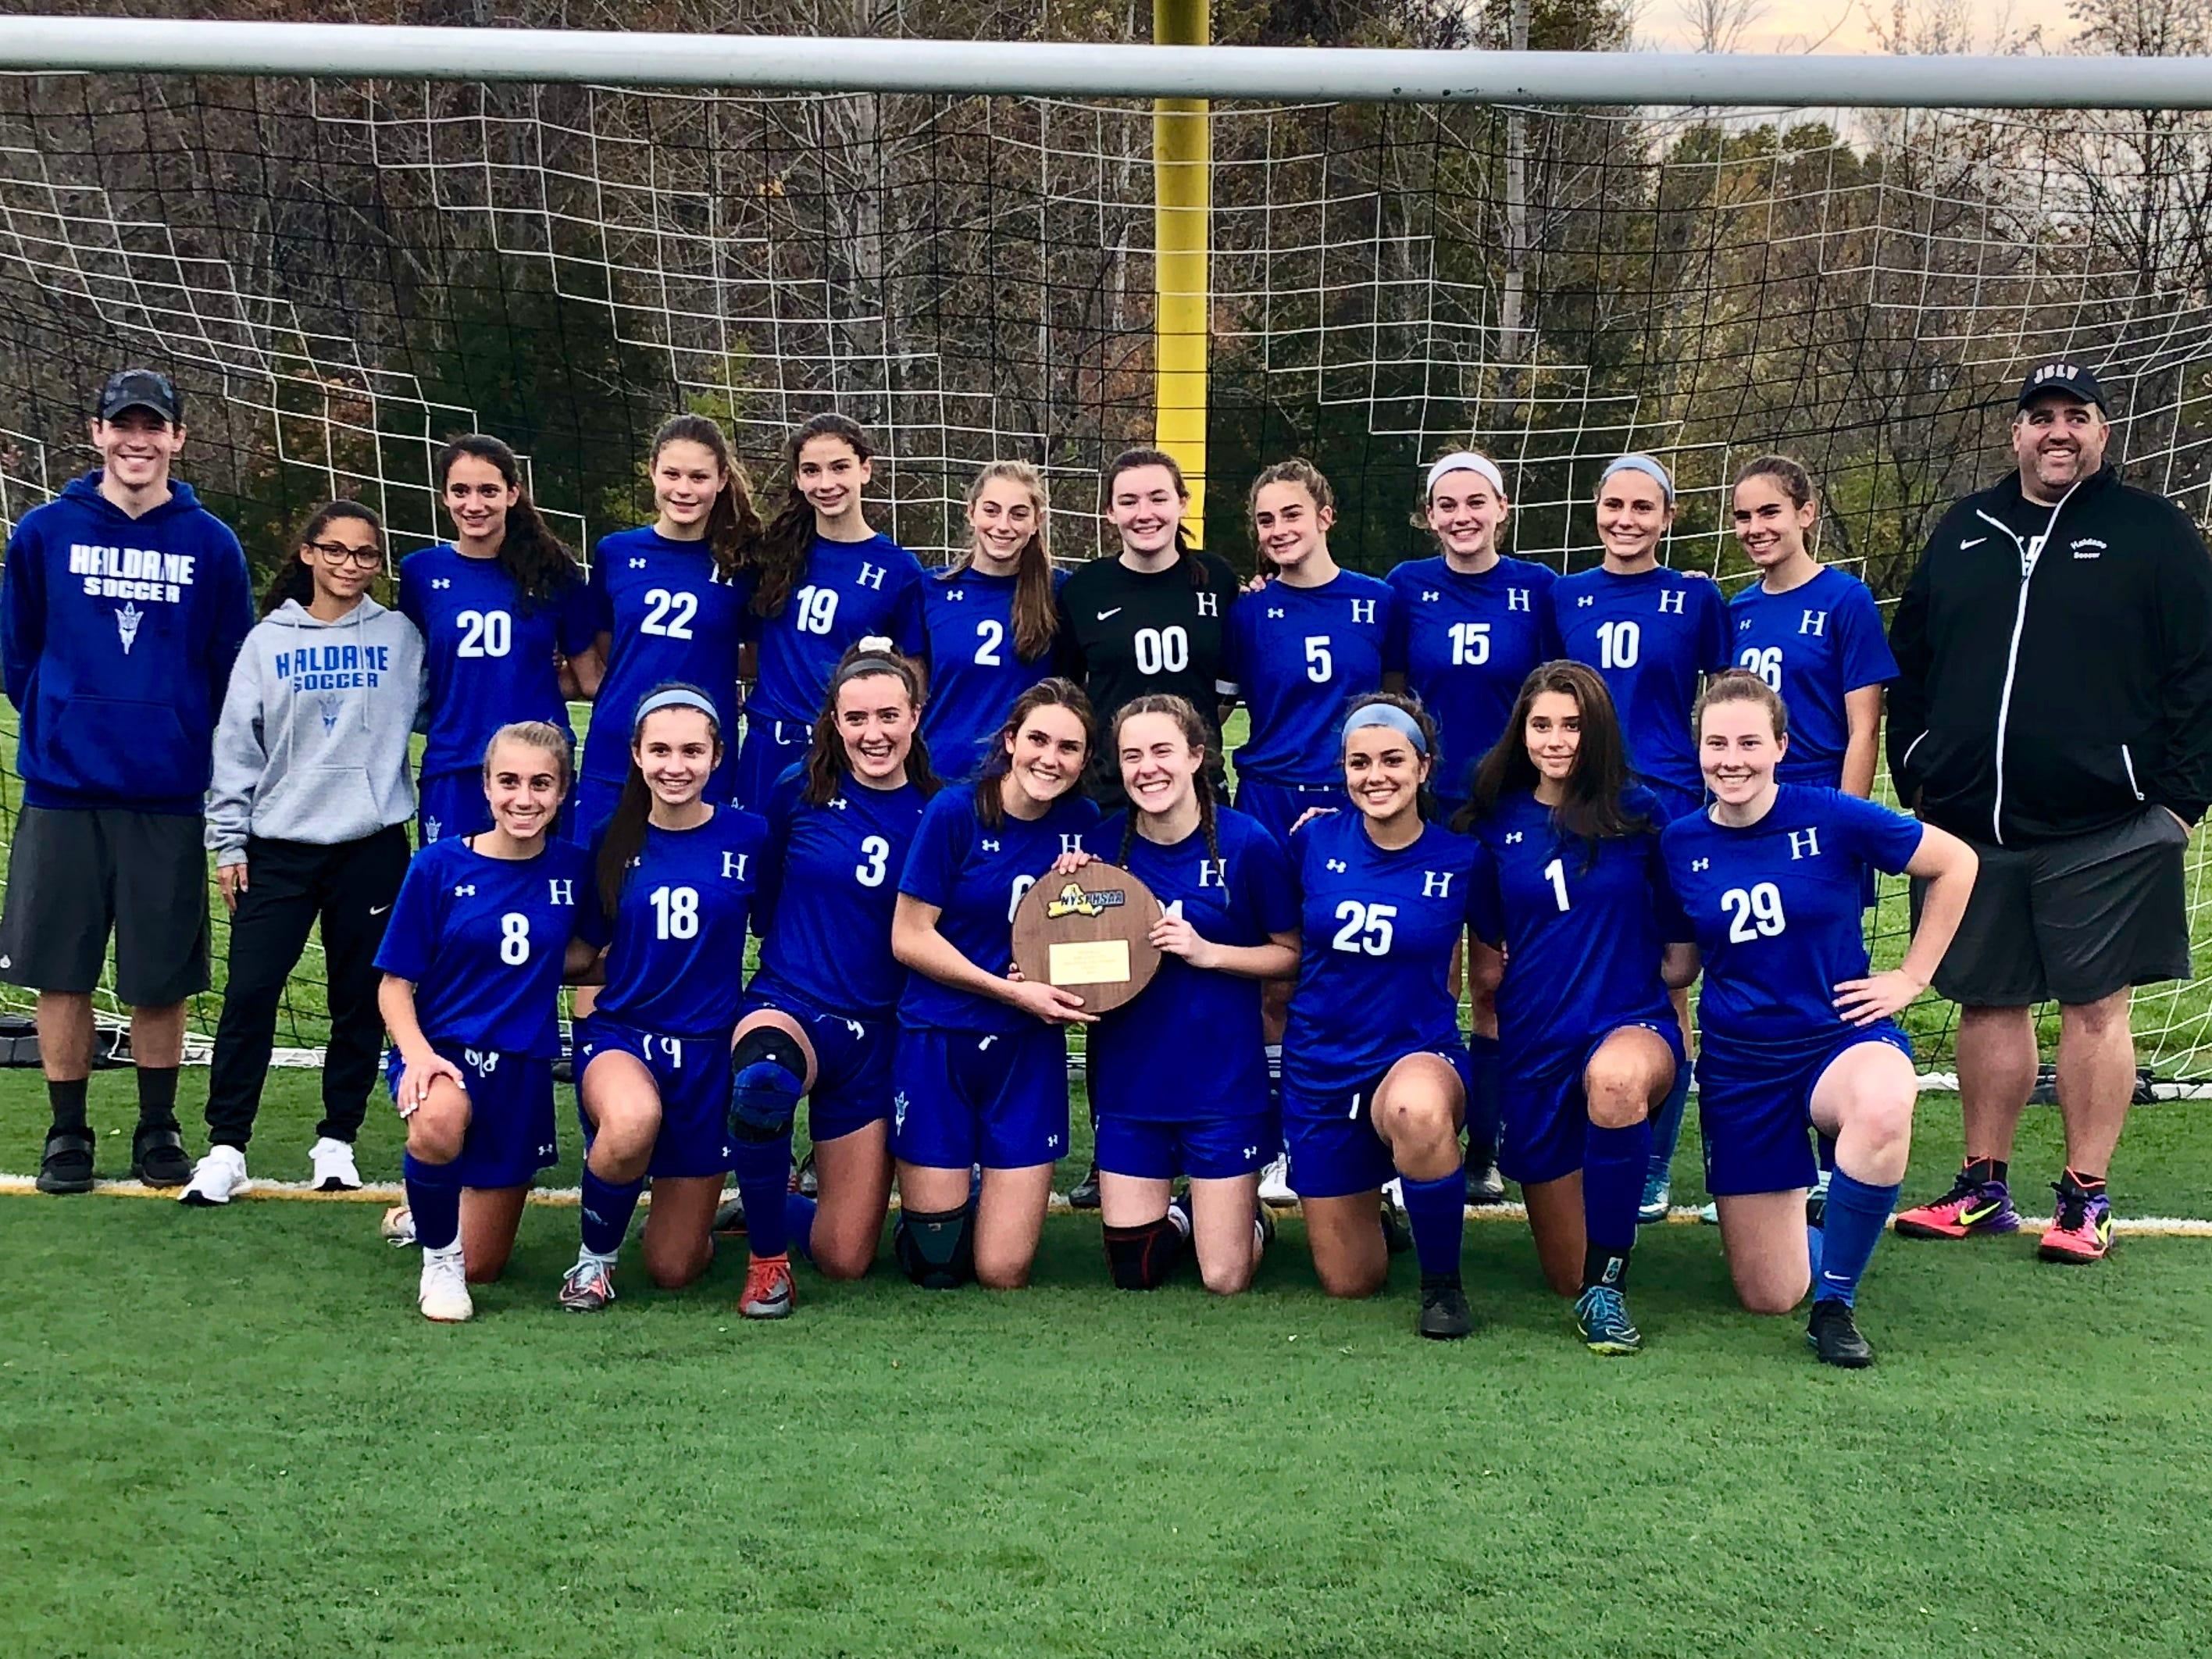 Heads held high despite Haldane's girls soccer season ending in state semifinals